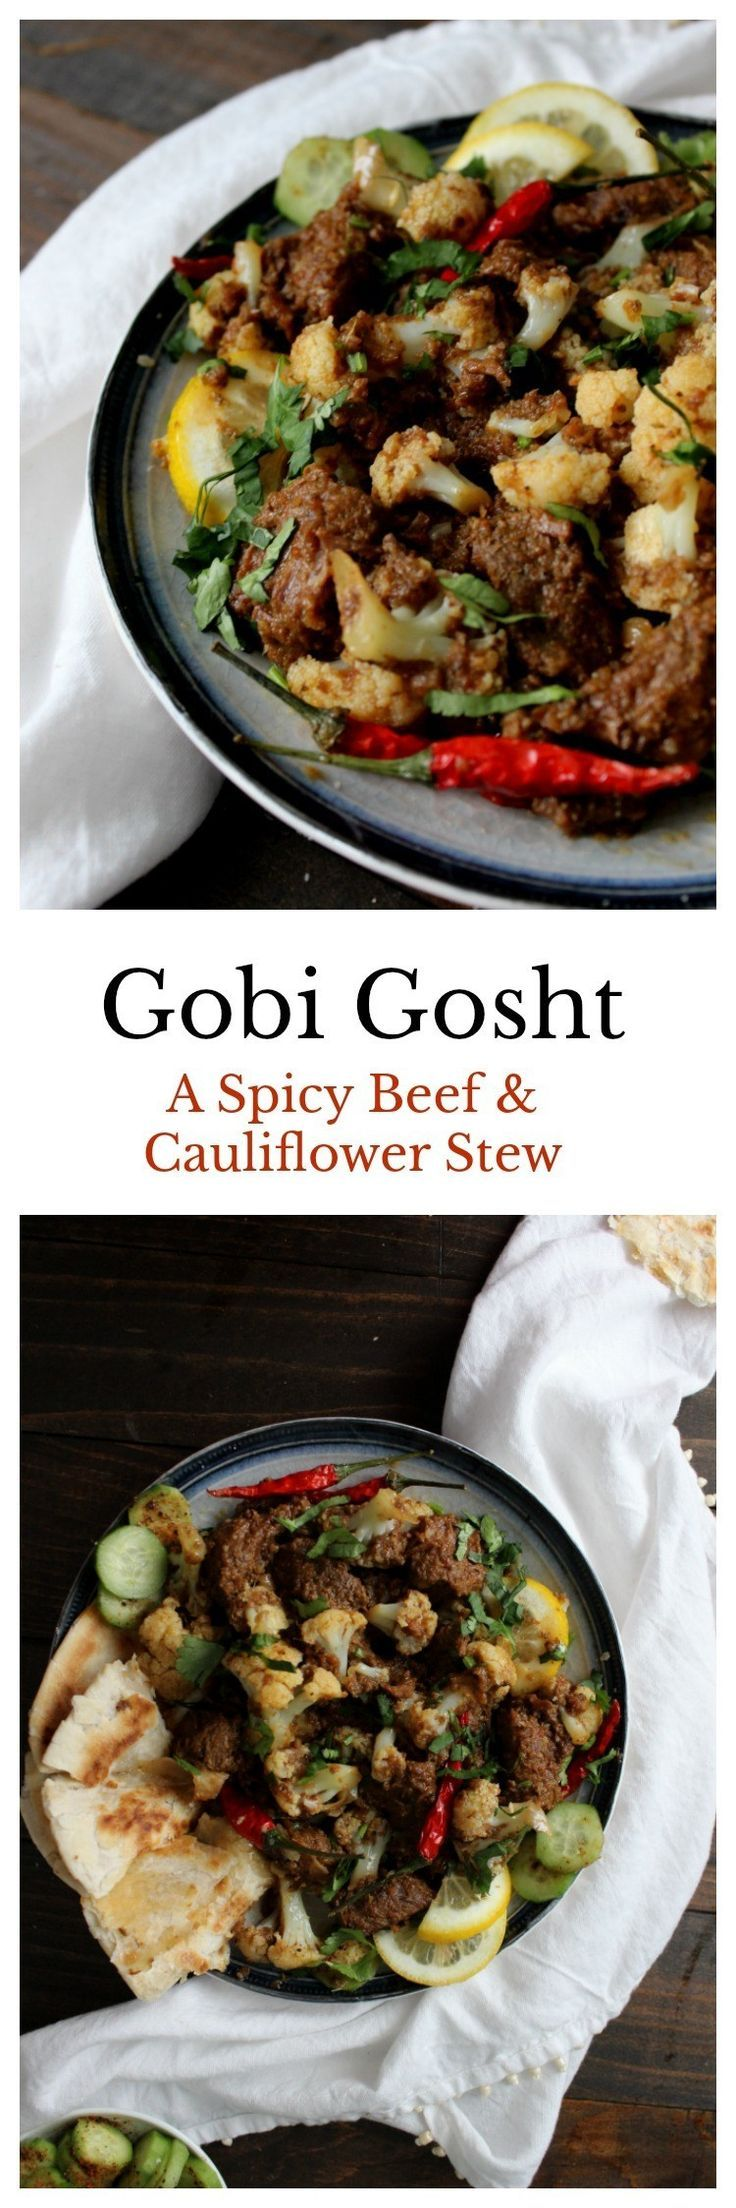 Gobi Gosht Beef Cauliflower Stew Recipe Indian Food Recipes Halal Recipes Spiced Beef